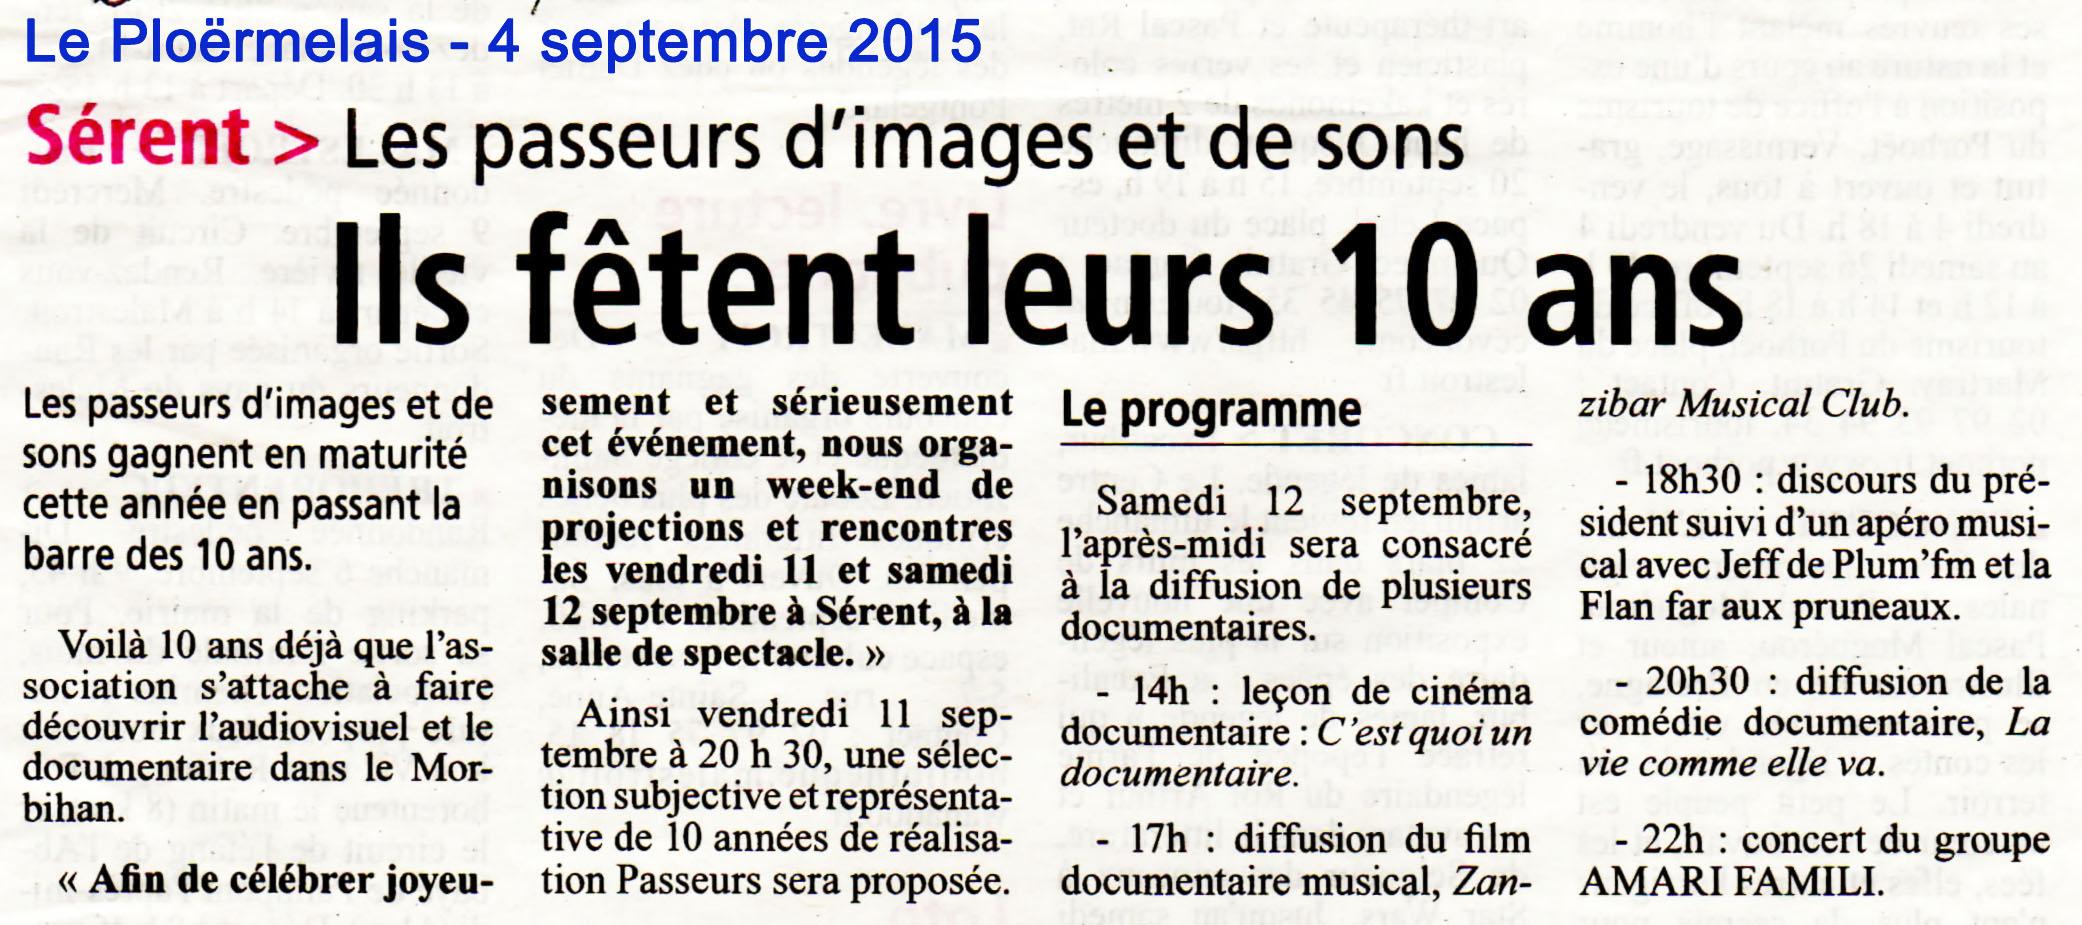 2015_09_04_10_ans_Passeurs_Ploërmelais.jpg